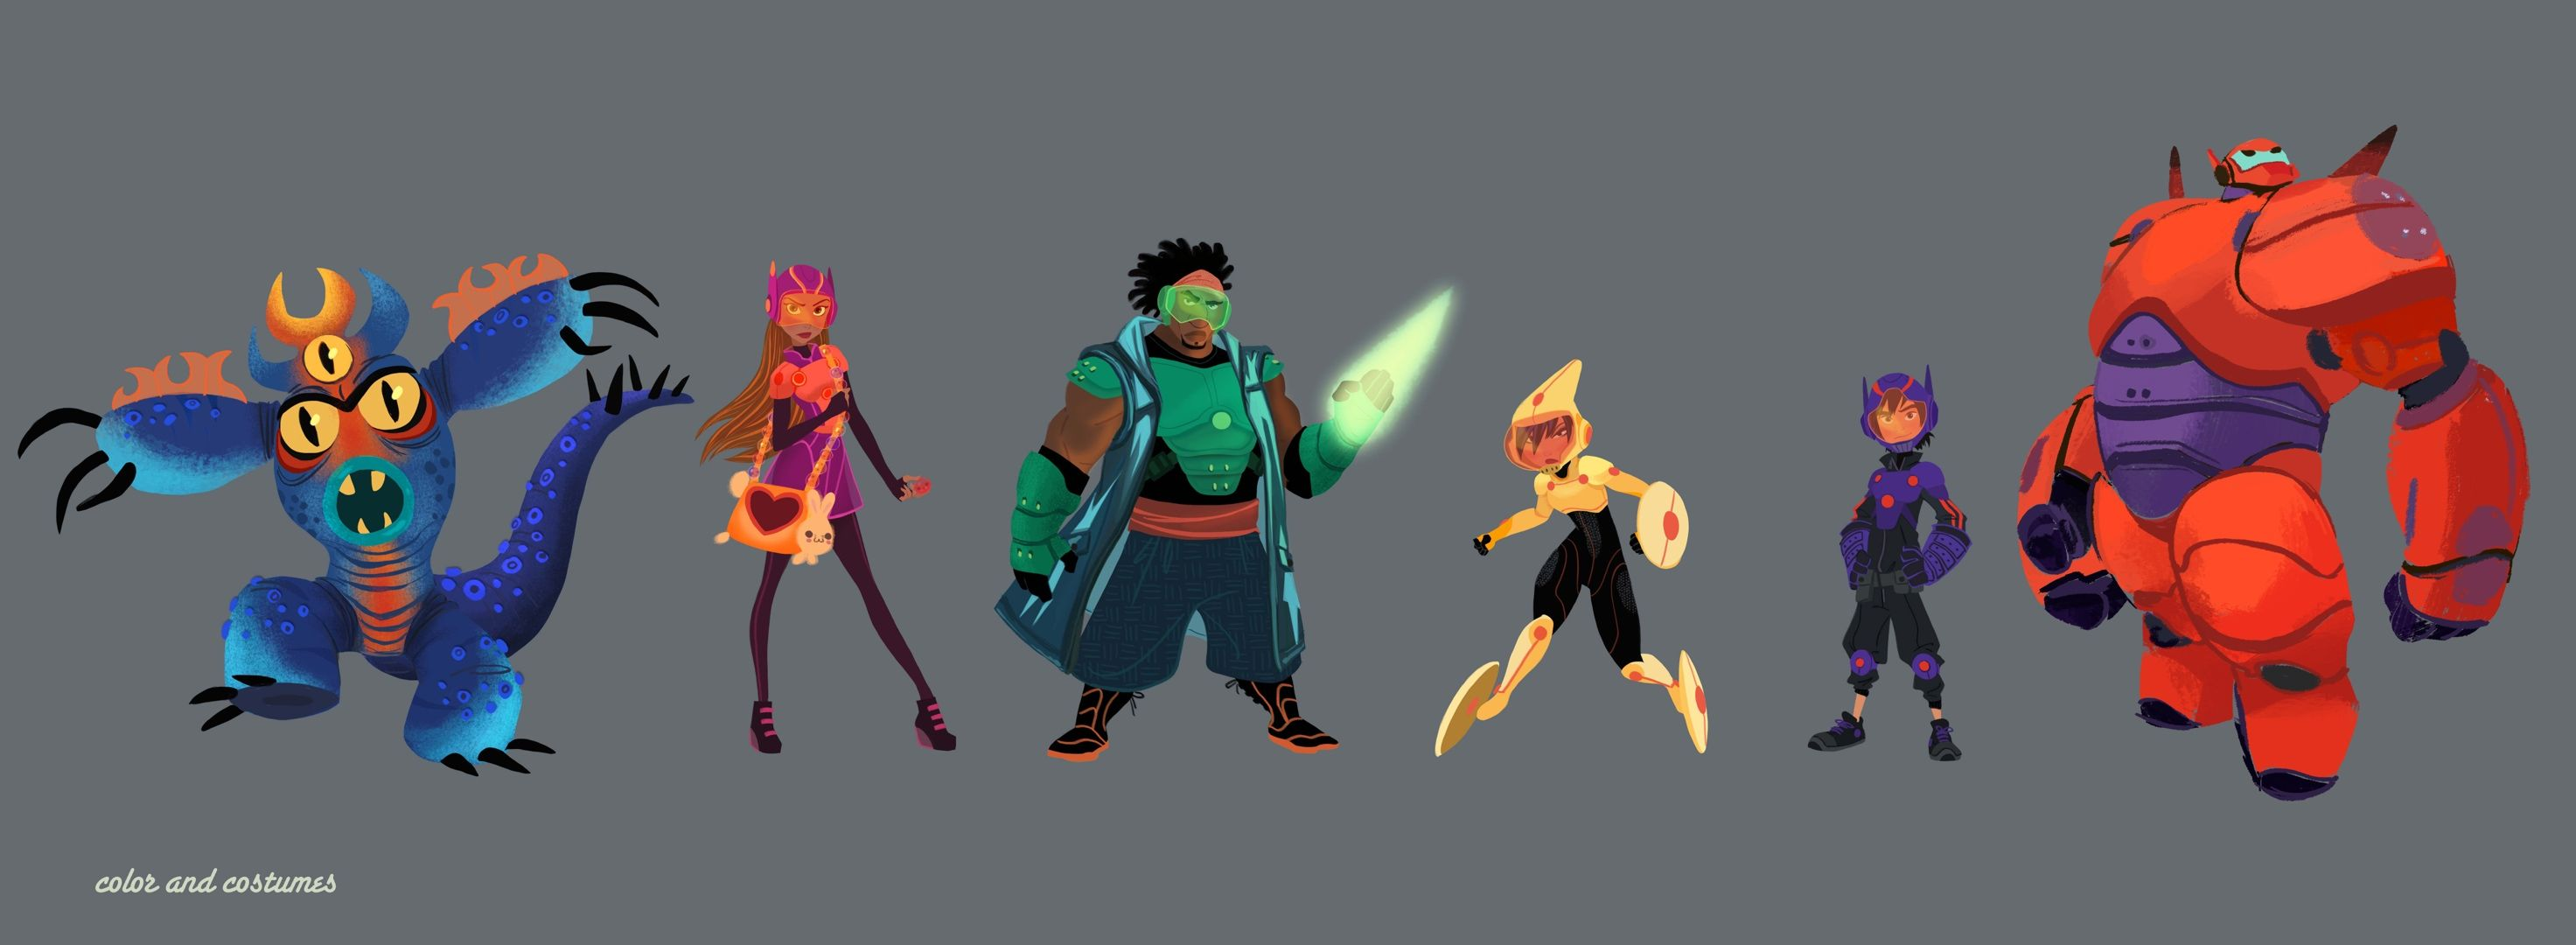 Big Hero 6 Anime Characters : Big hero animation pinterest characters and